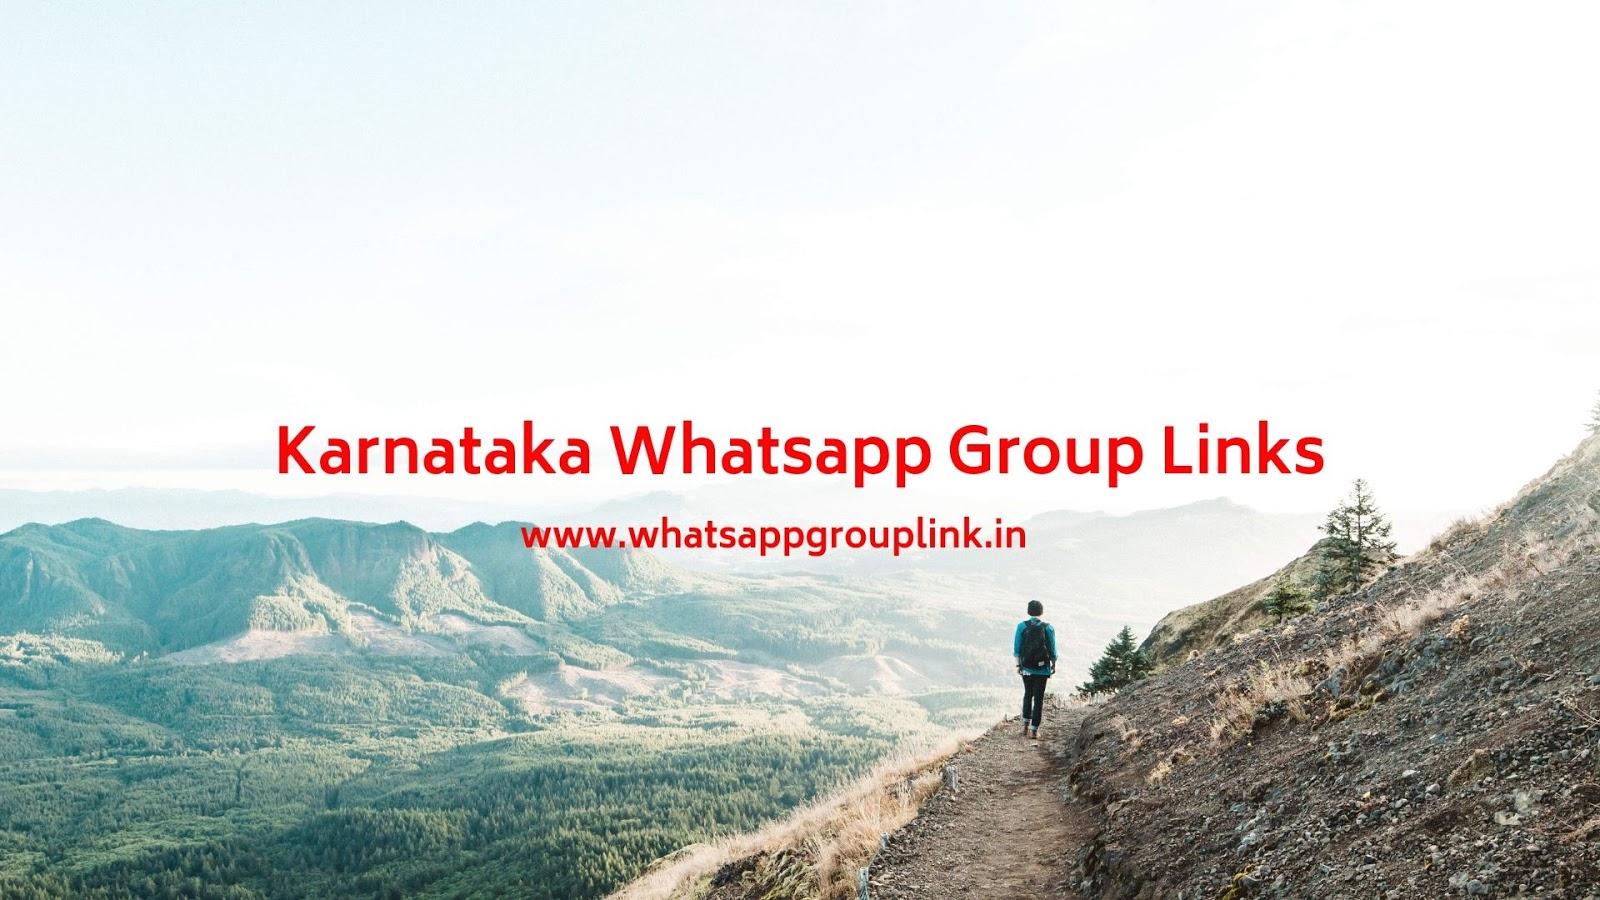 Whatsapp Group Link: Karnataka Whatsapp Group Links